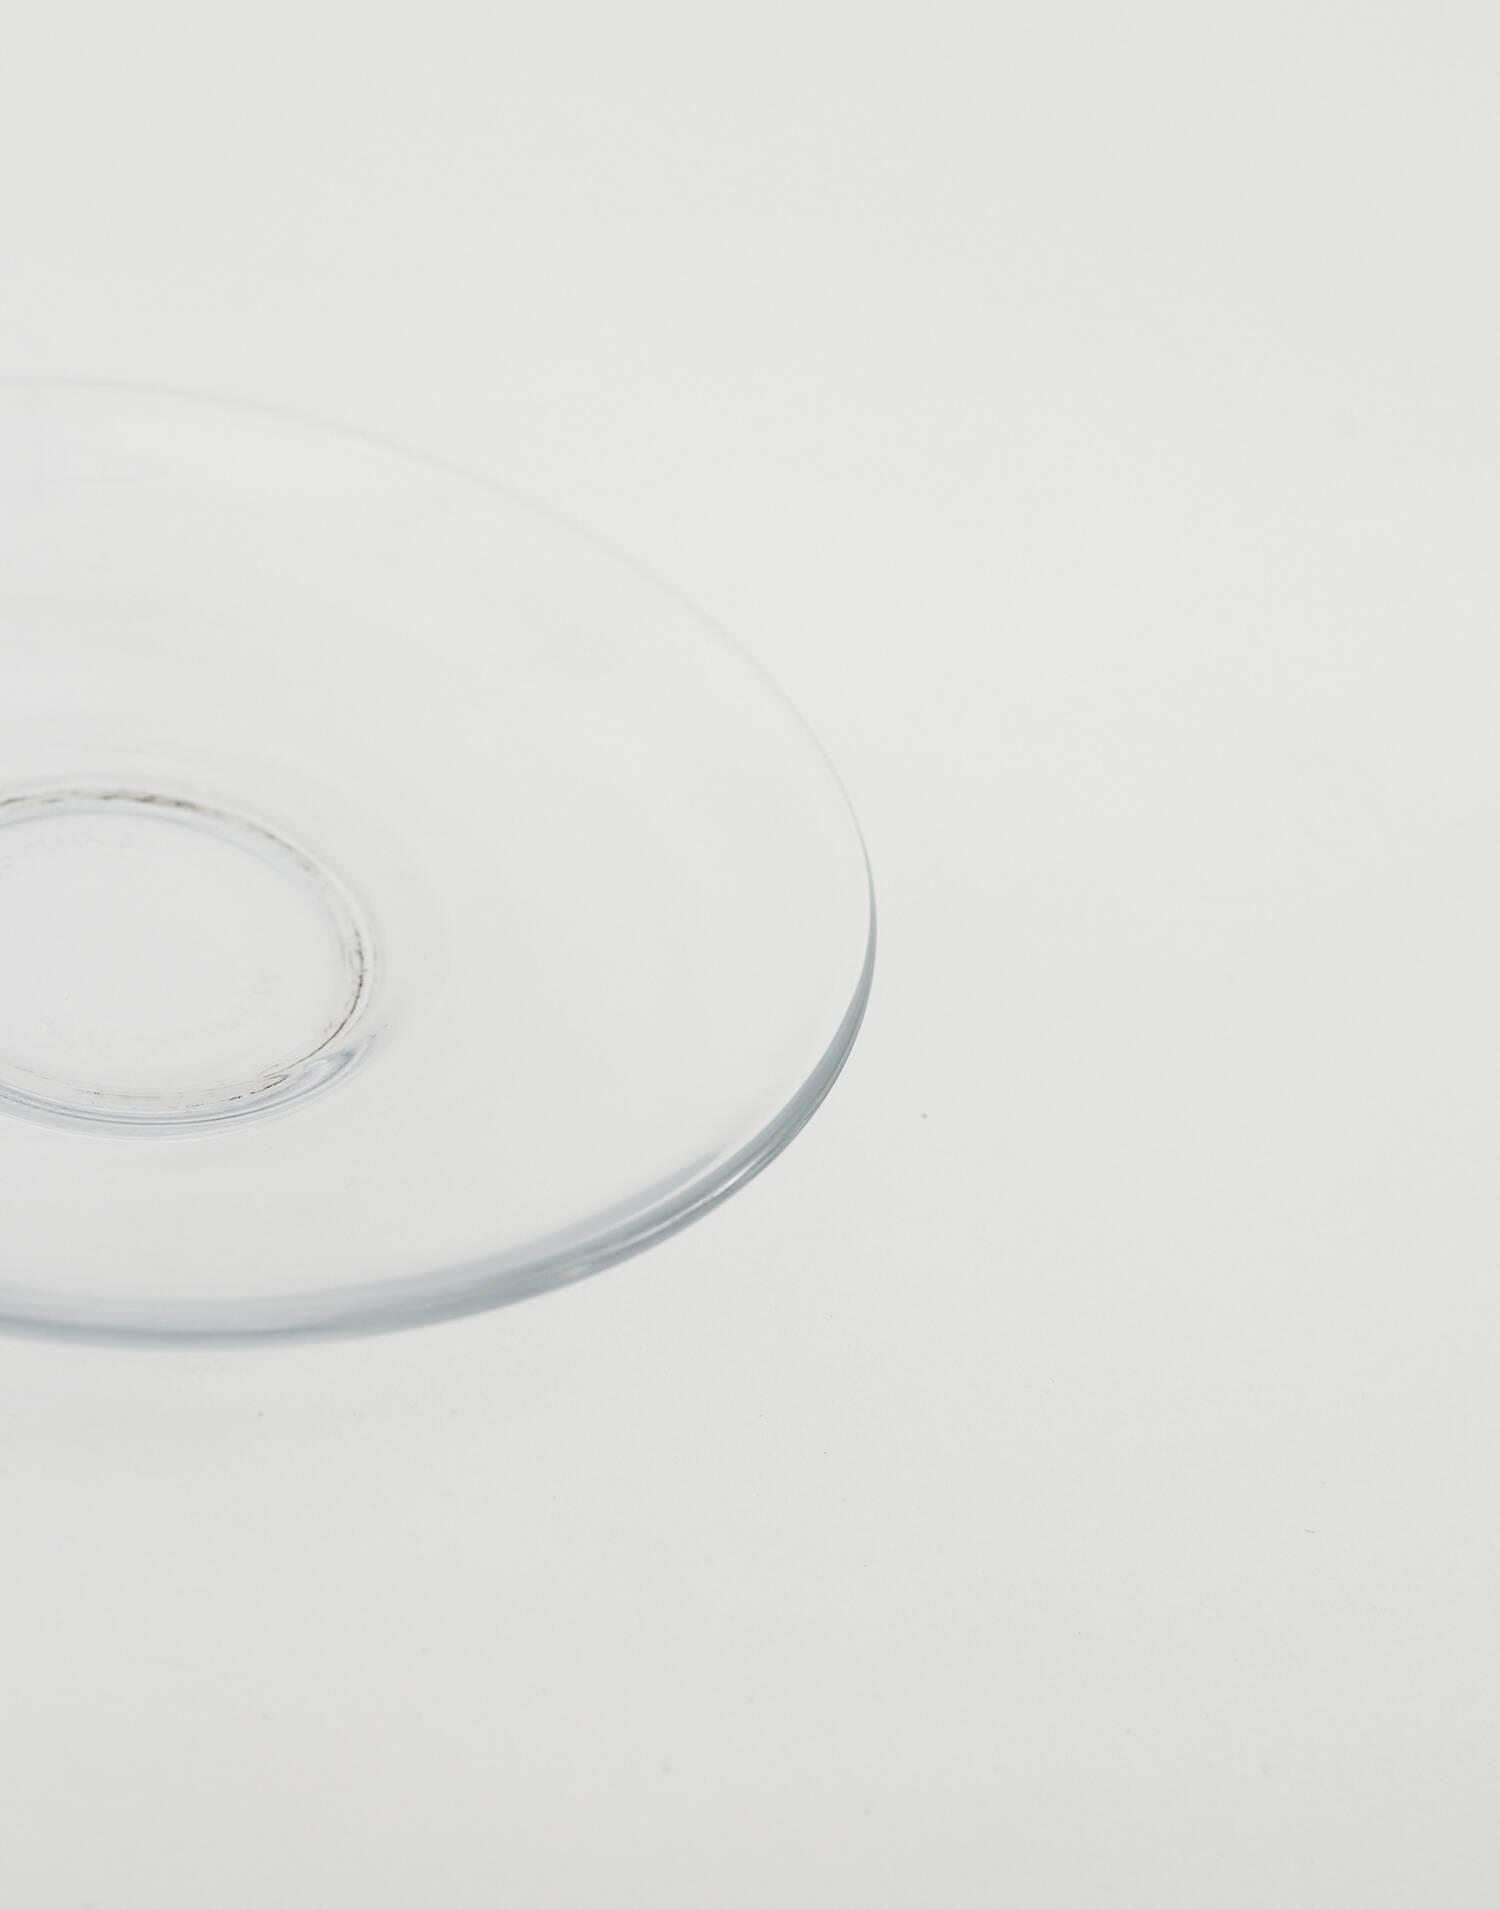 Small plate set